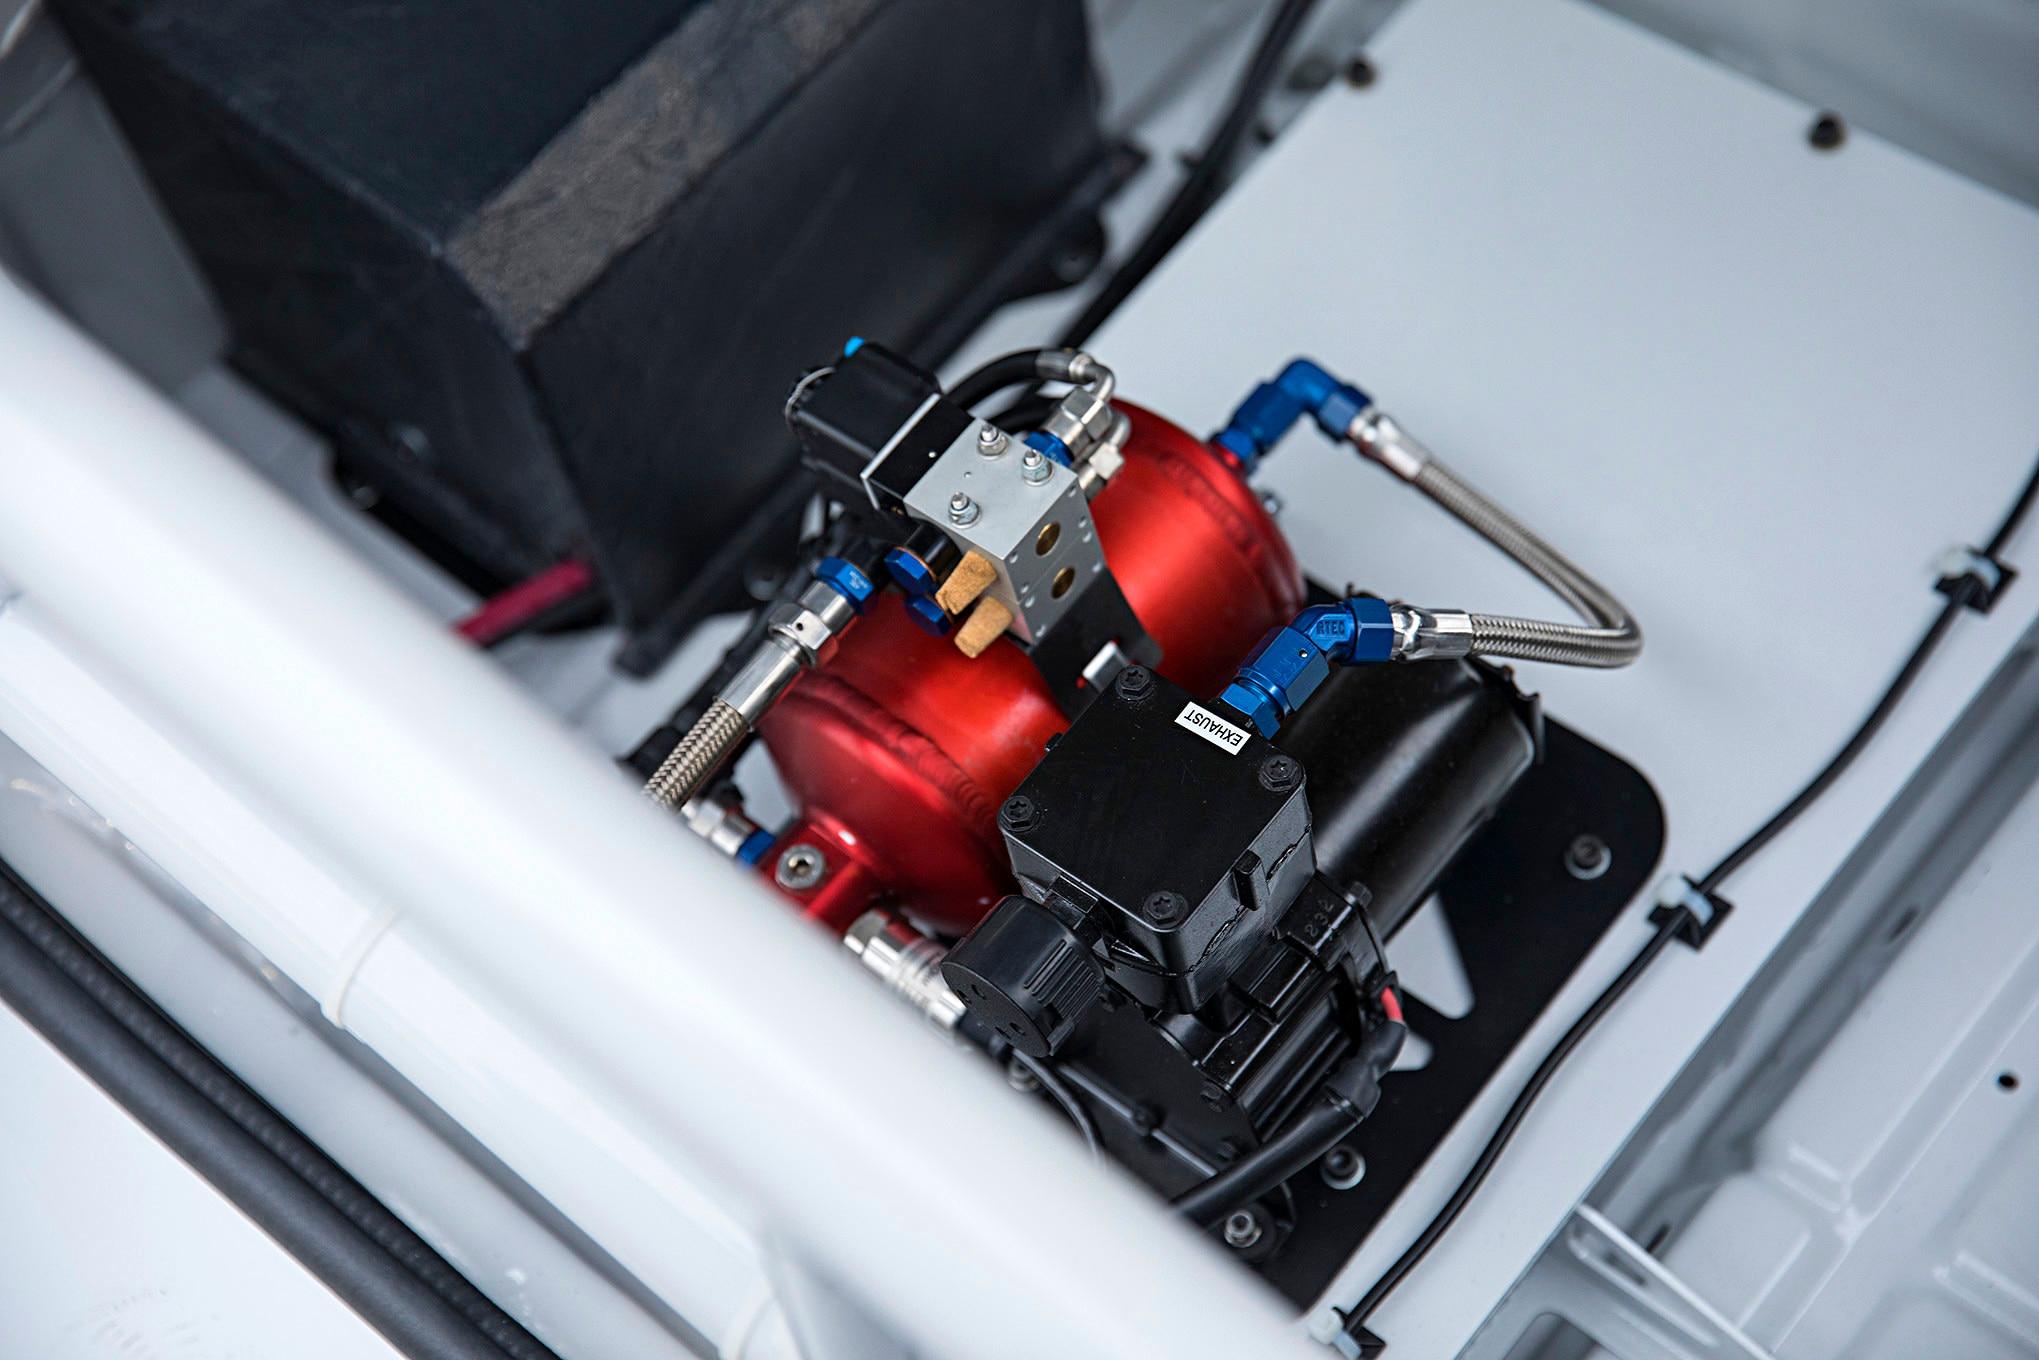 Gt350 Gt4 Ford Mustang Race Car Jr Pesek 019